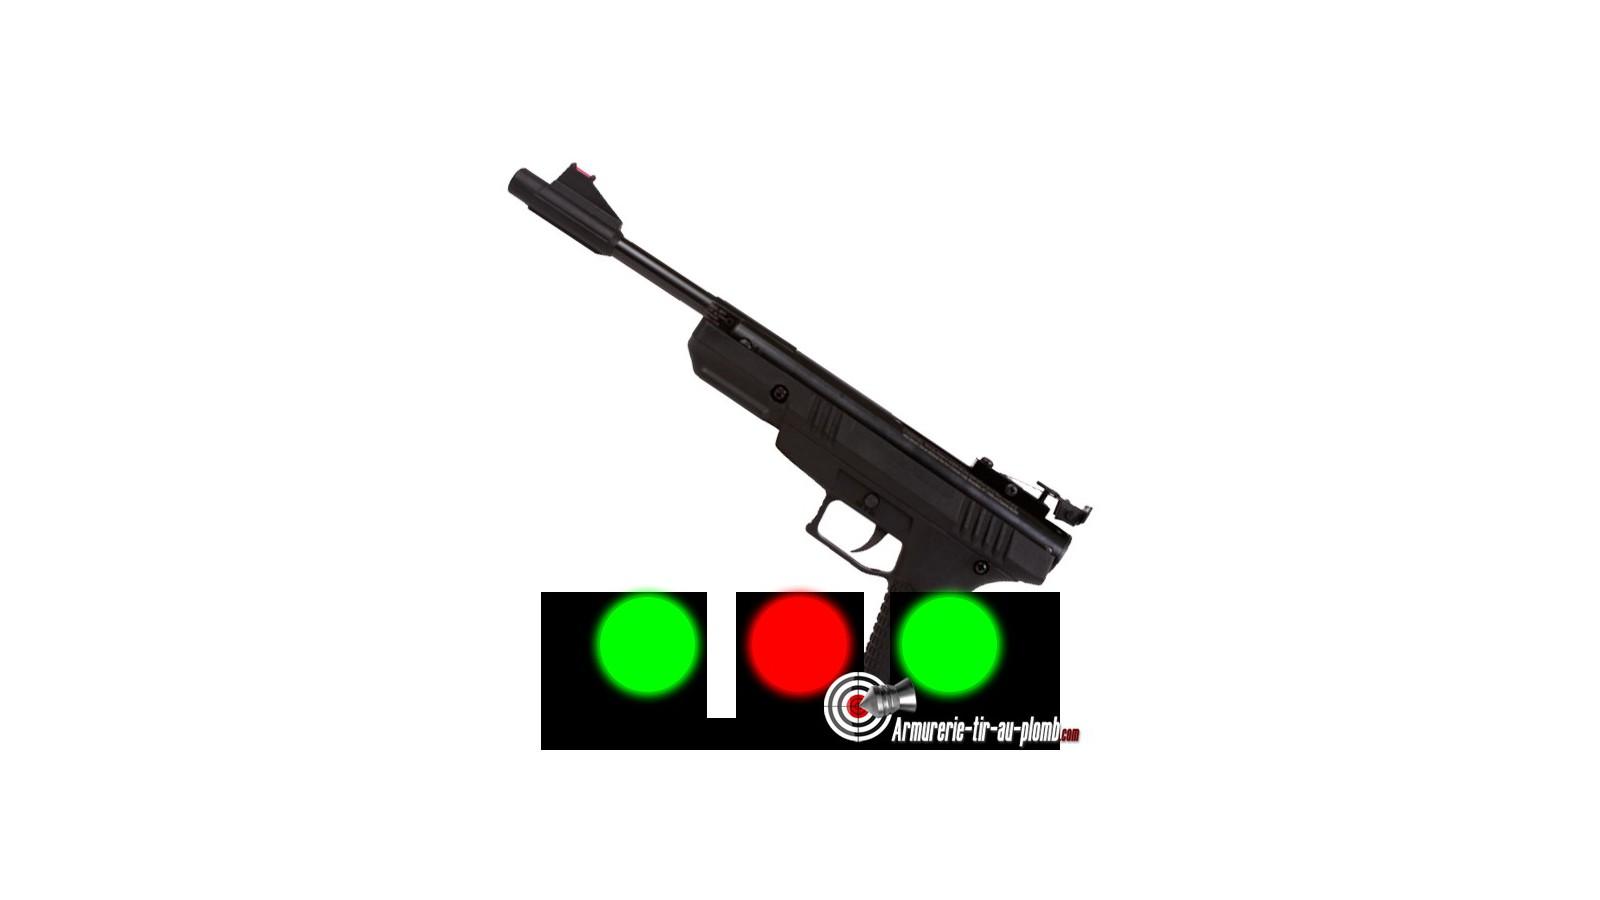 Benjamin Trail Nitro Piston Pistol - Pistolet à plombs diabolo